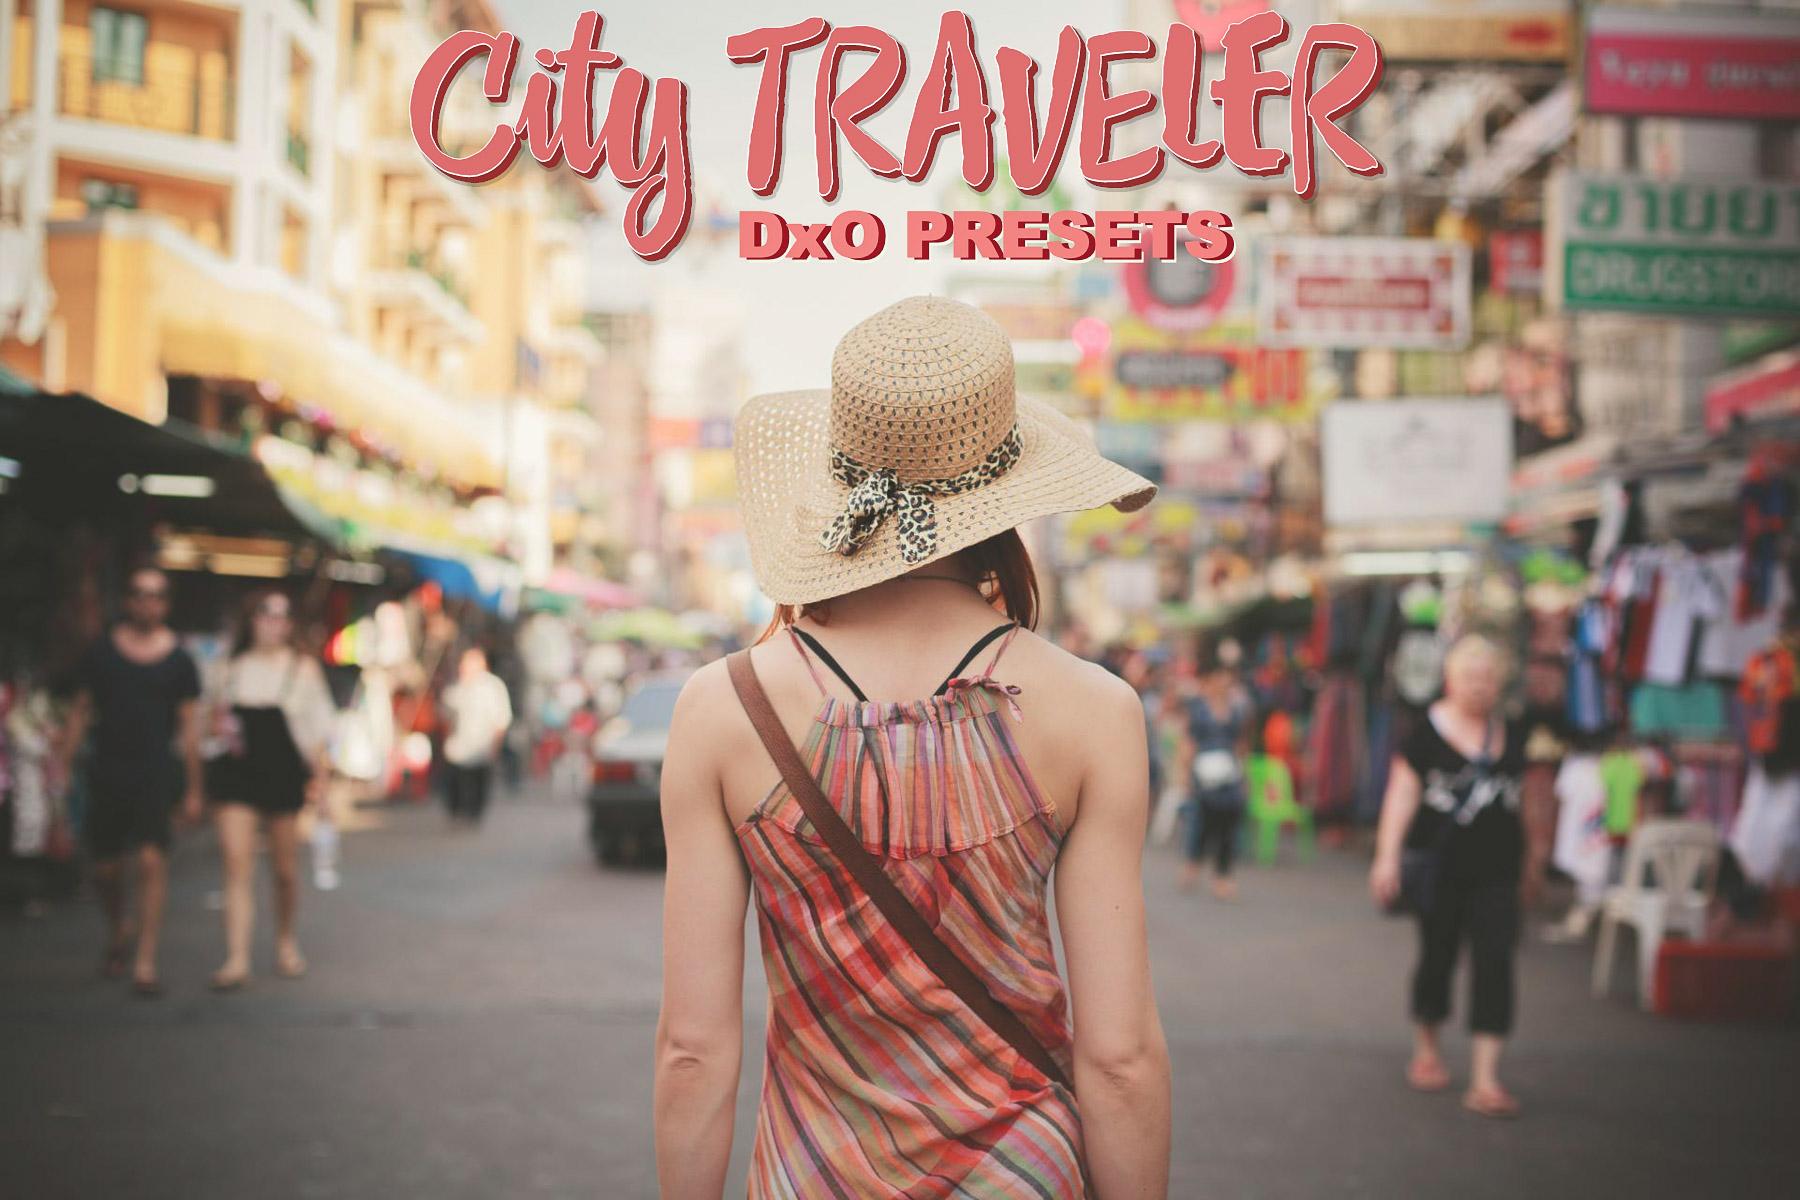 DxO City TRAVELER presets